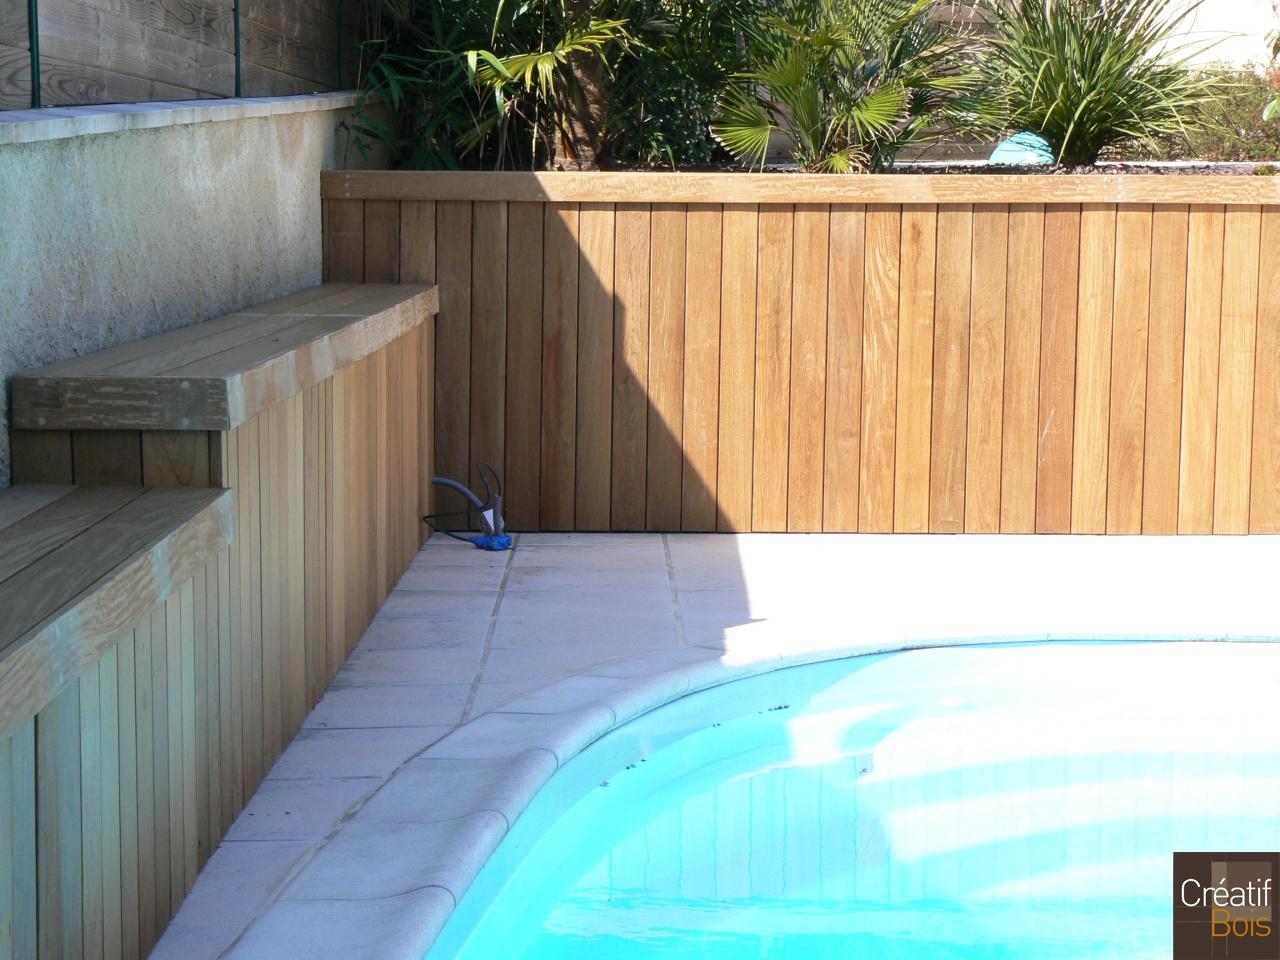 Accessoires piscine cr atif bois malemort corr ze 19 for Accessoires piscine